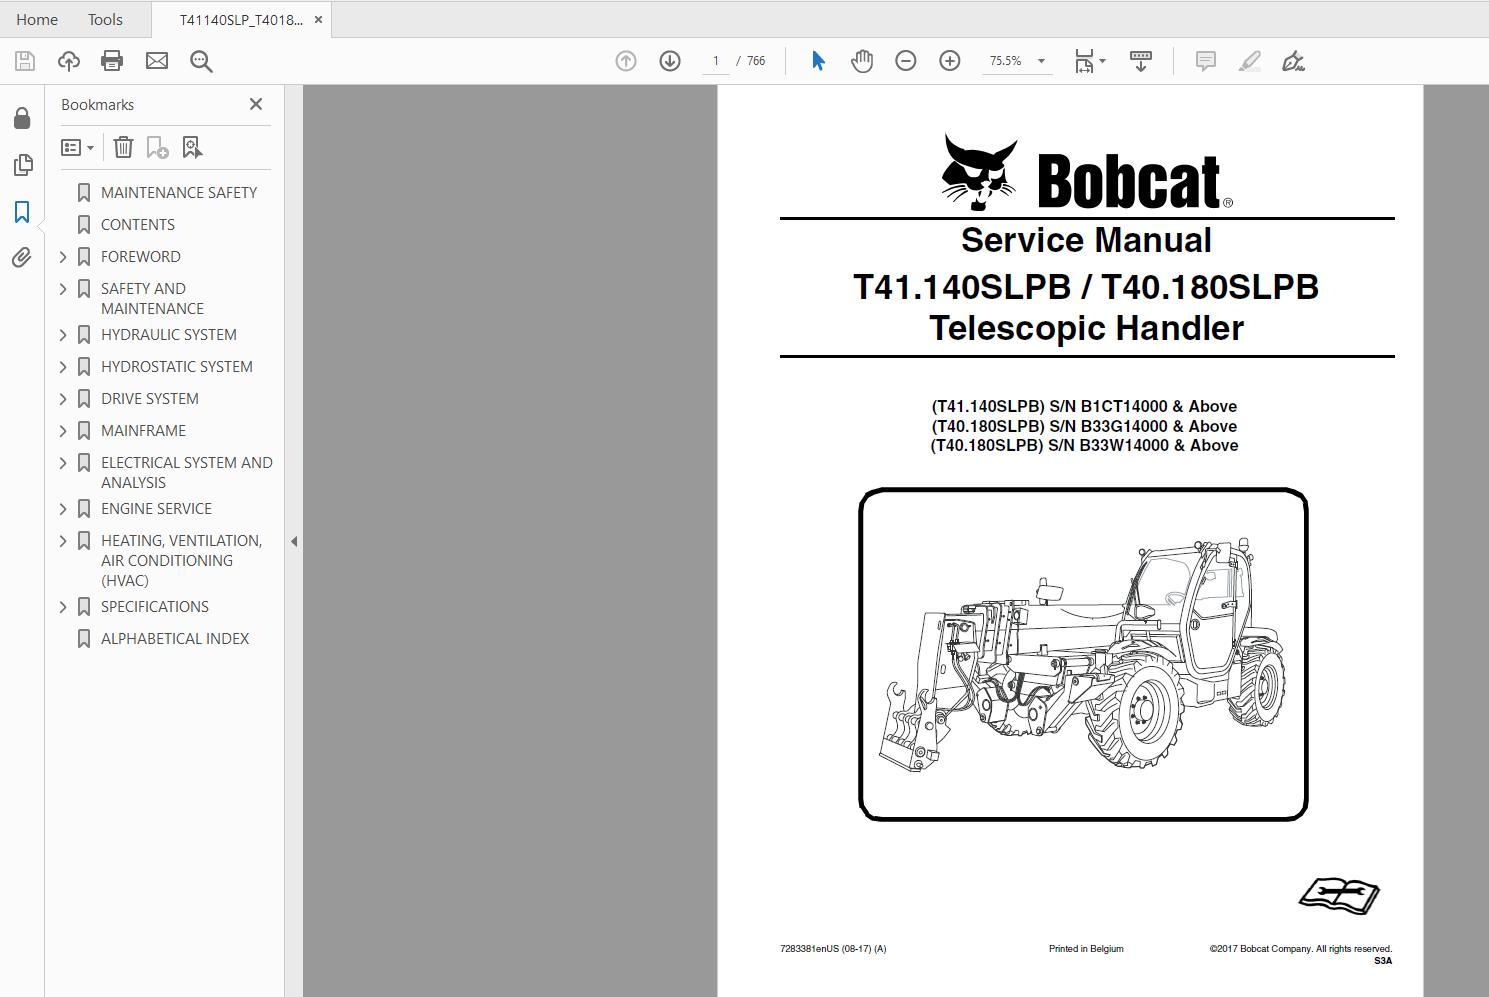 Bobcat_Versa_HANDLER_TTC_Telescopic_Handler_Service_Library_2017_DVD9